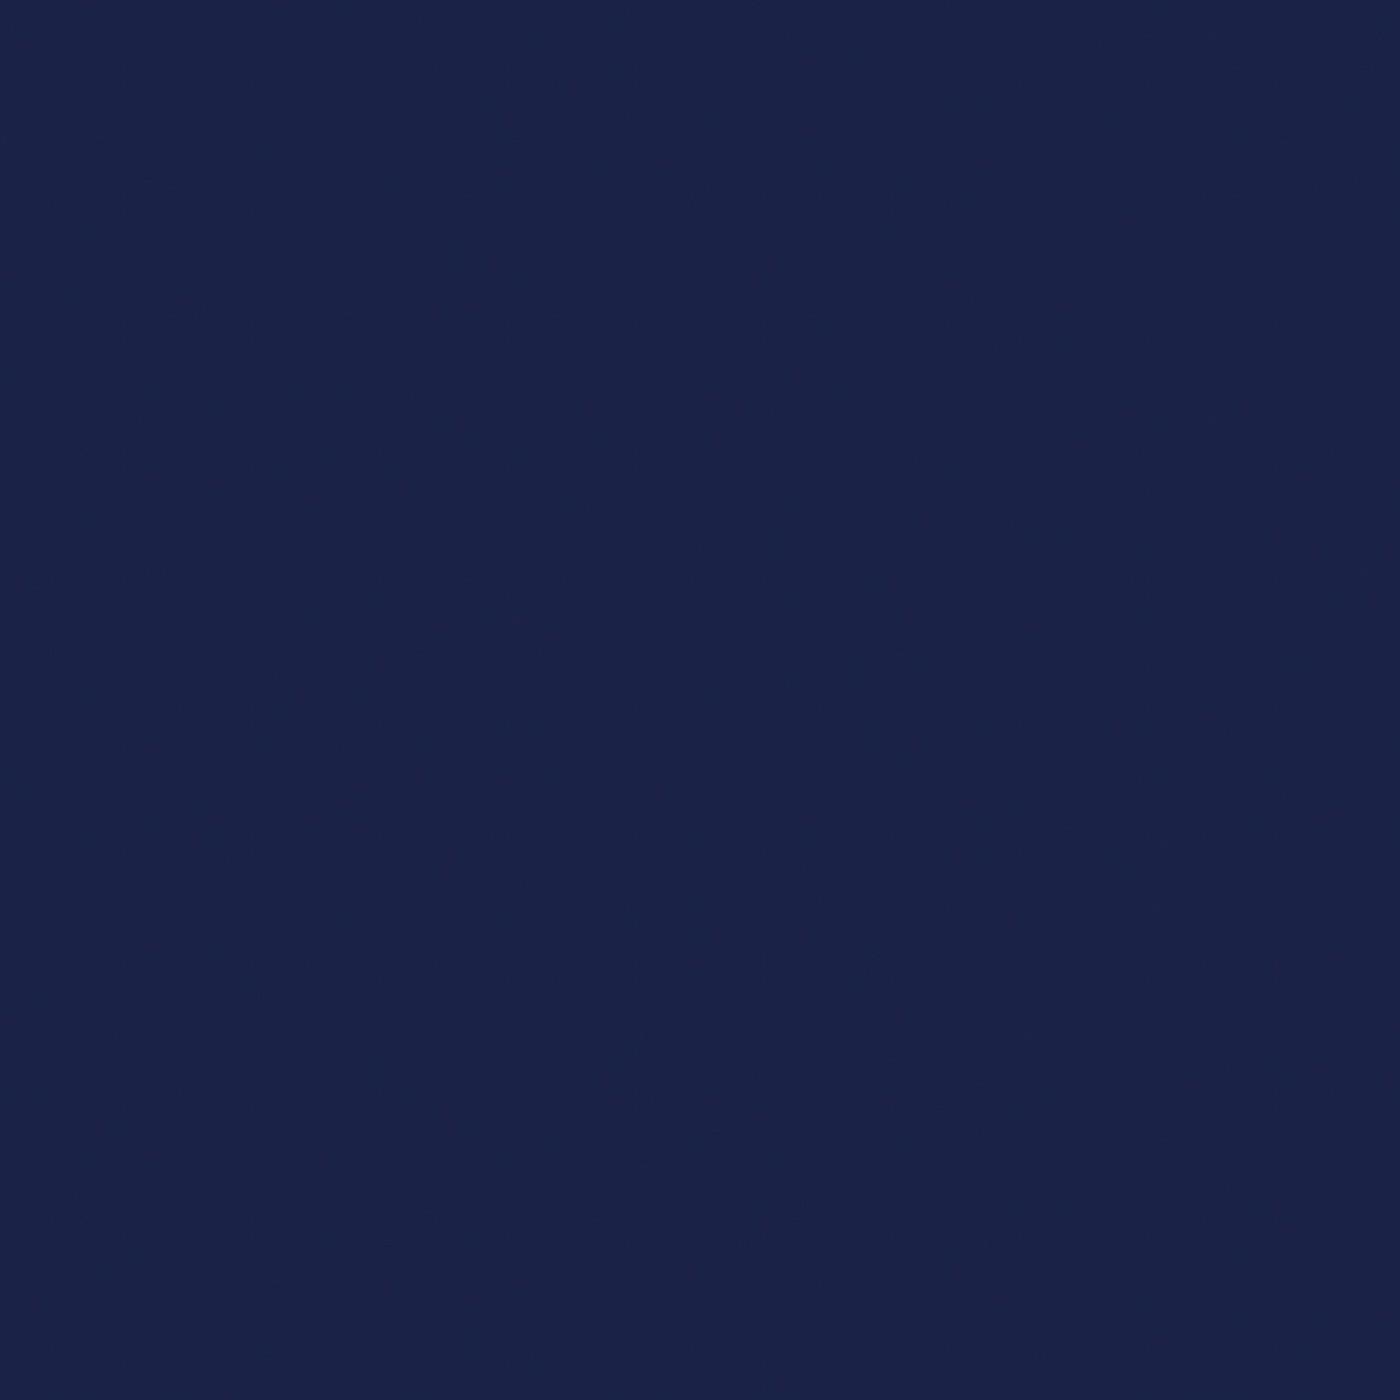 Tecido TNT 80 100% Polipropileno 1,40 Mt Largura Azul Marinho